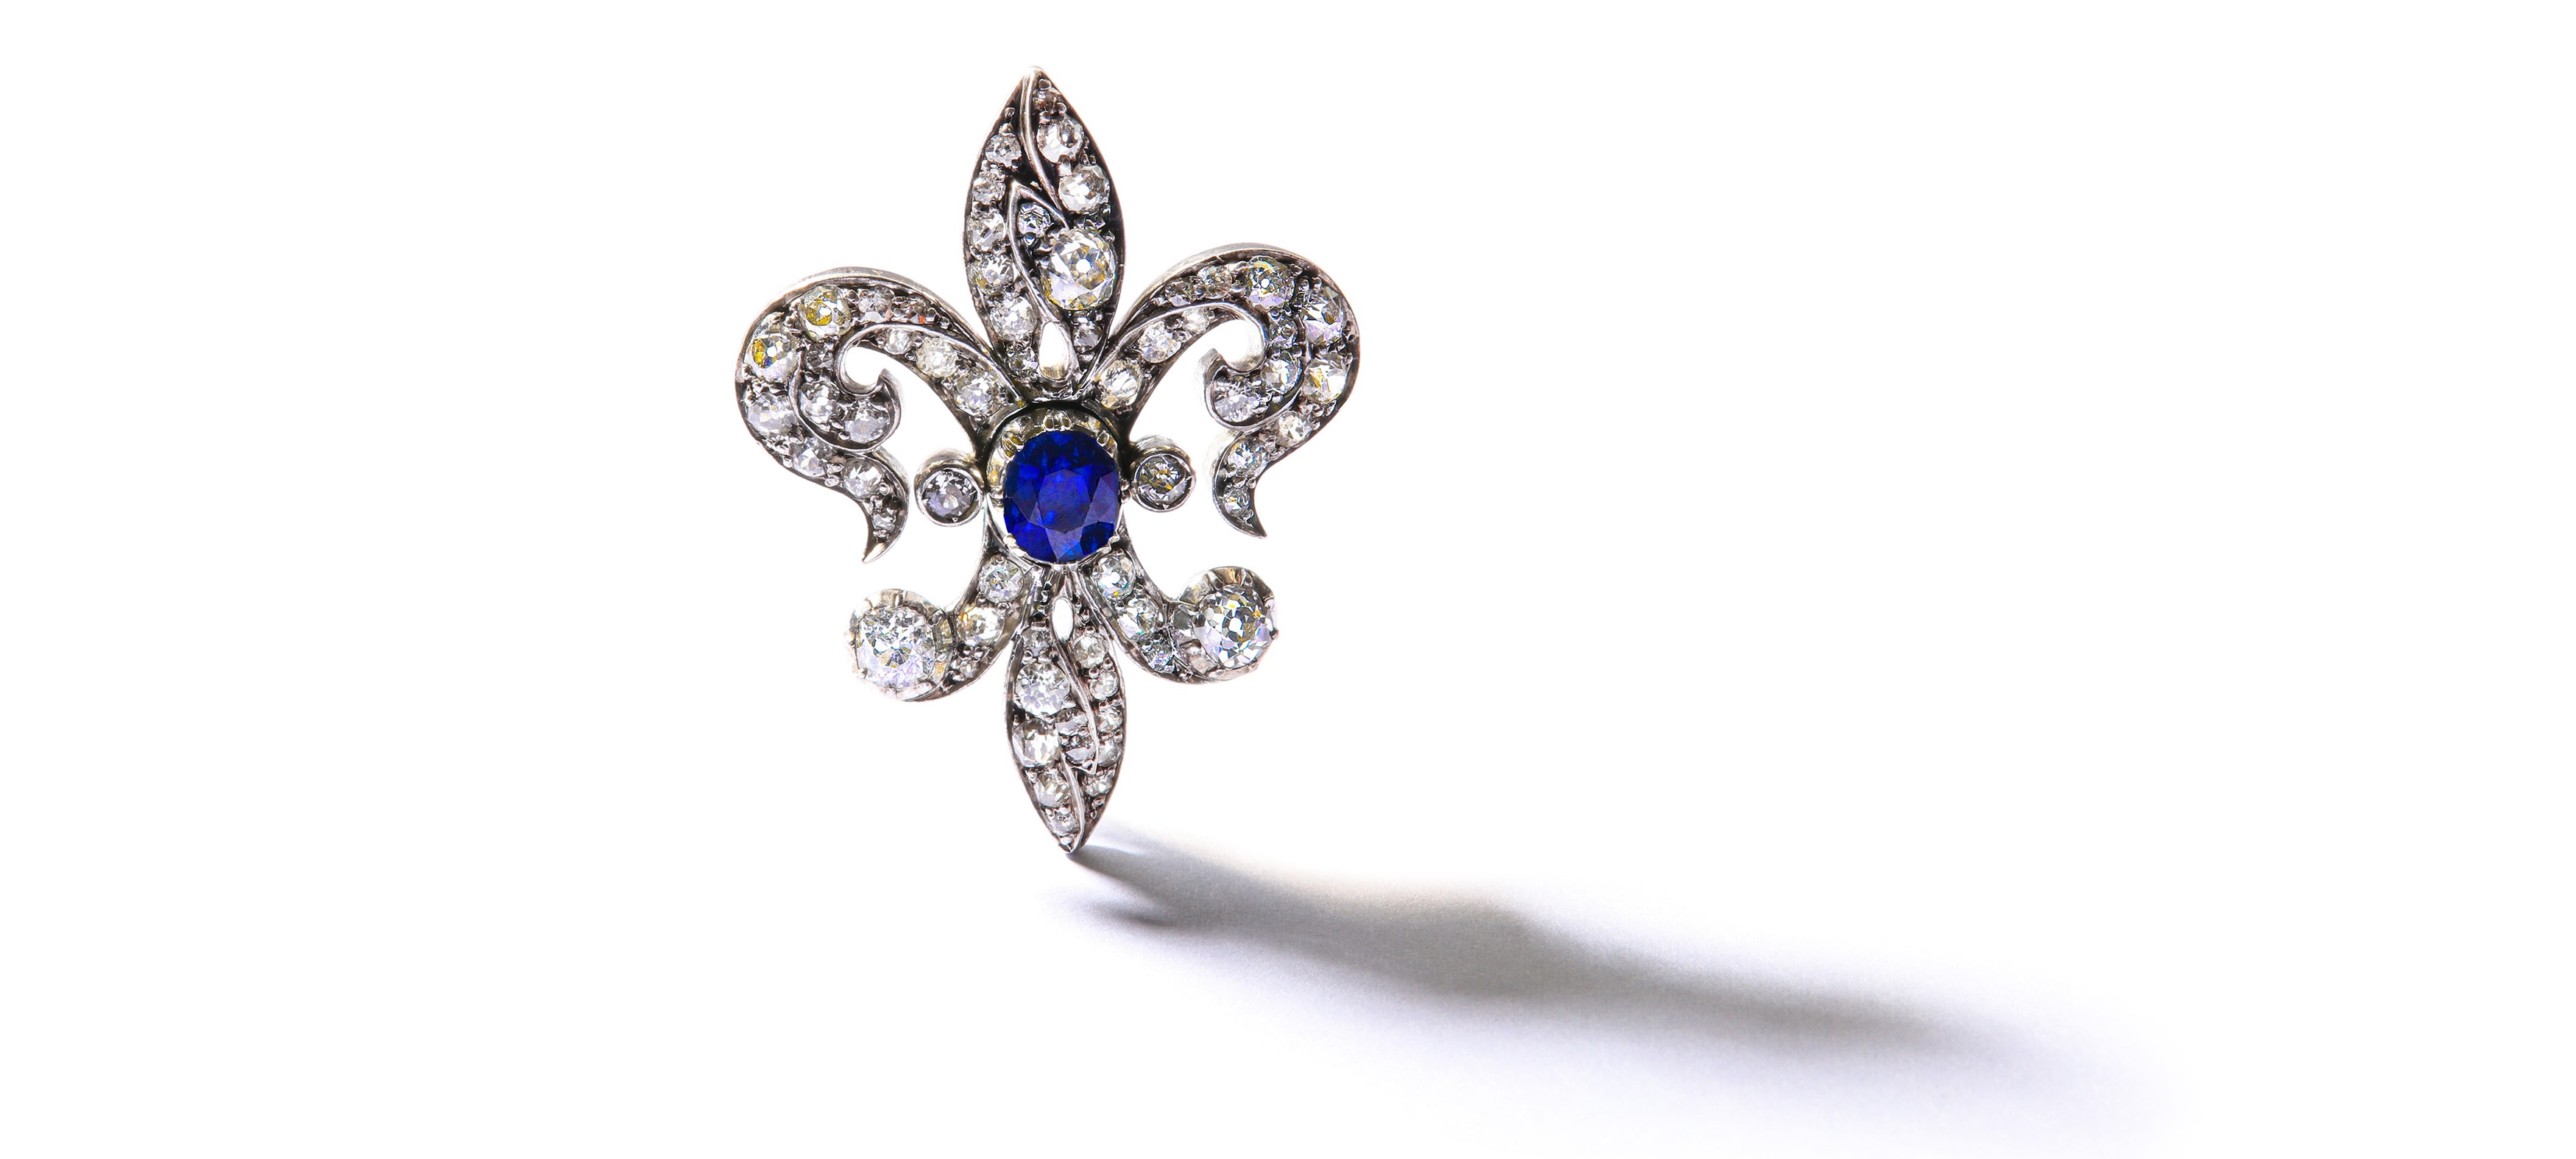 Sapphire and Diamond Brooch